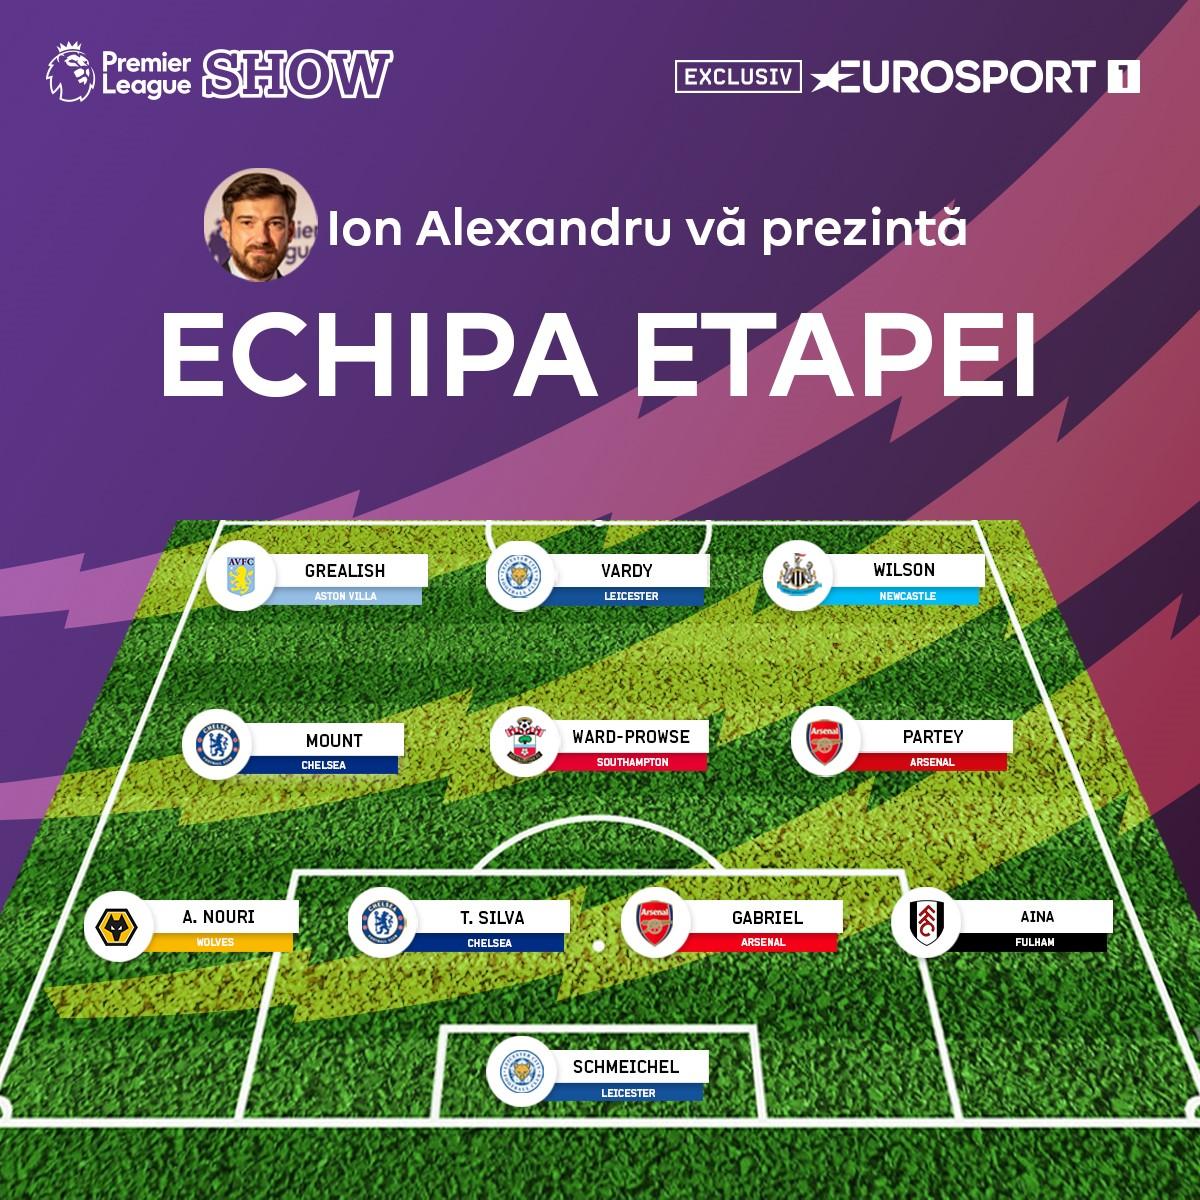 https://i.eurosport.com/2020/11/03/2927742.jpg